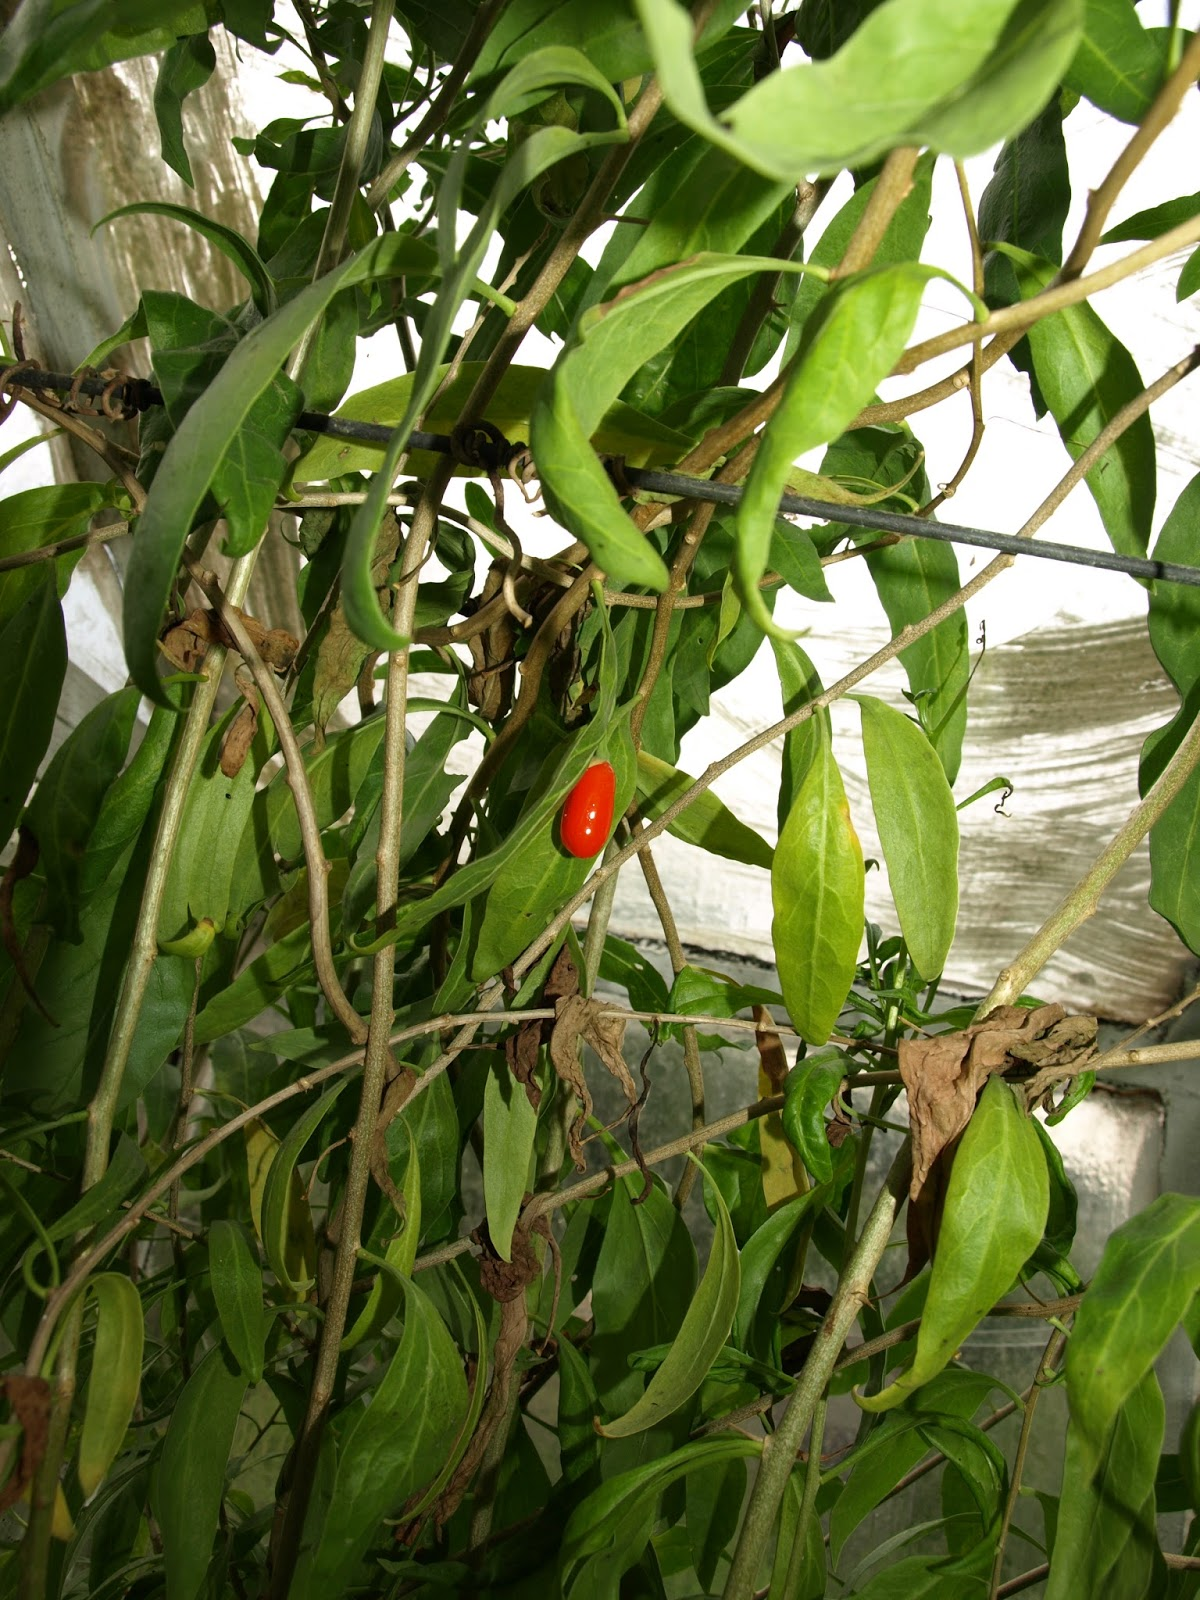 Ro liny tropikalne kolcow j chi ski jagody goji z nasion for Jagody goji w tabletkach